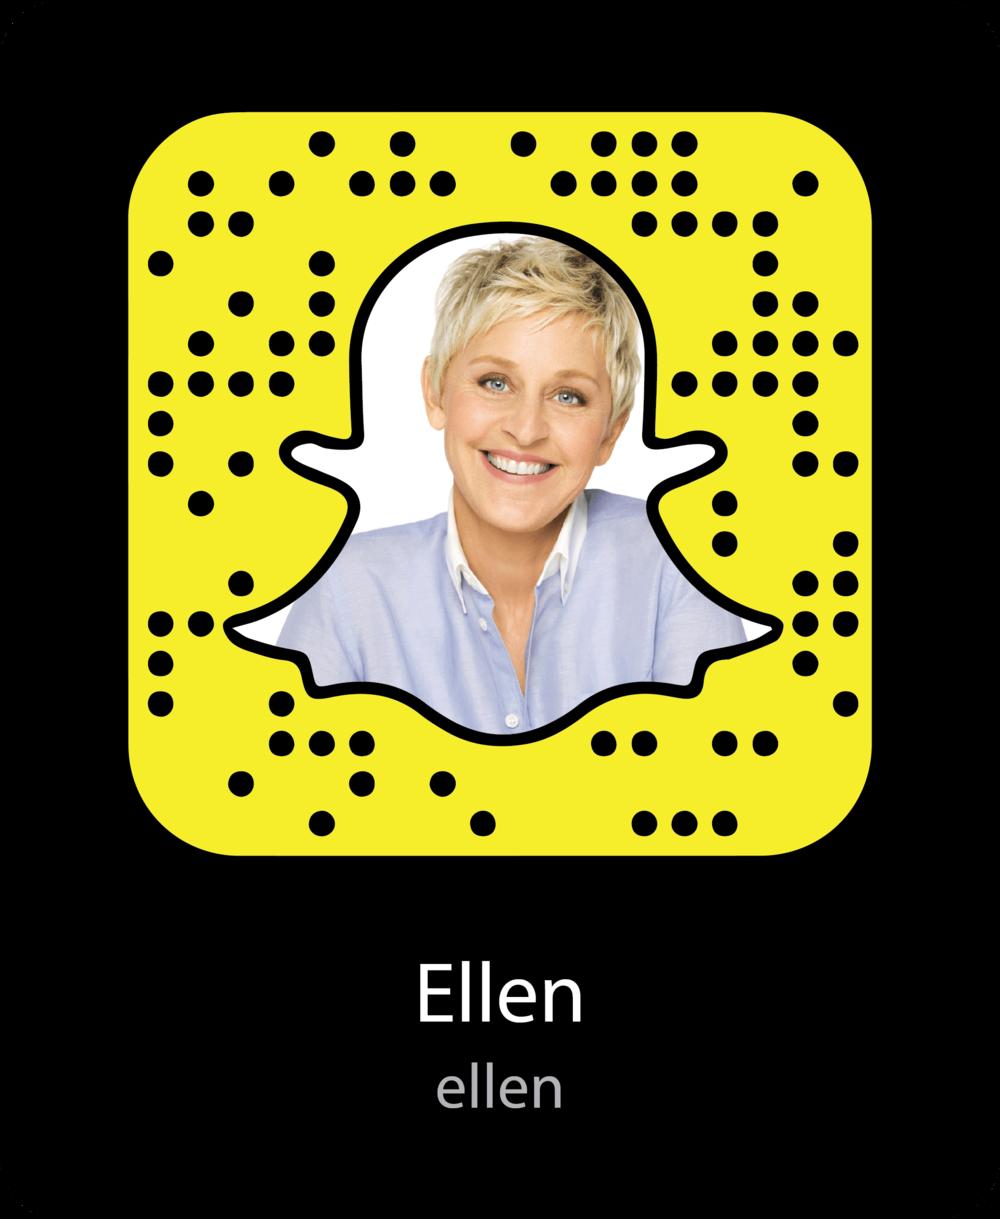 ellen-celebrity-snapchat-snapcode